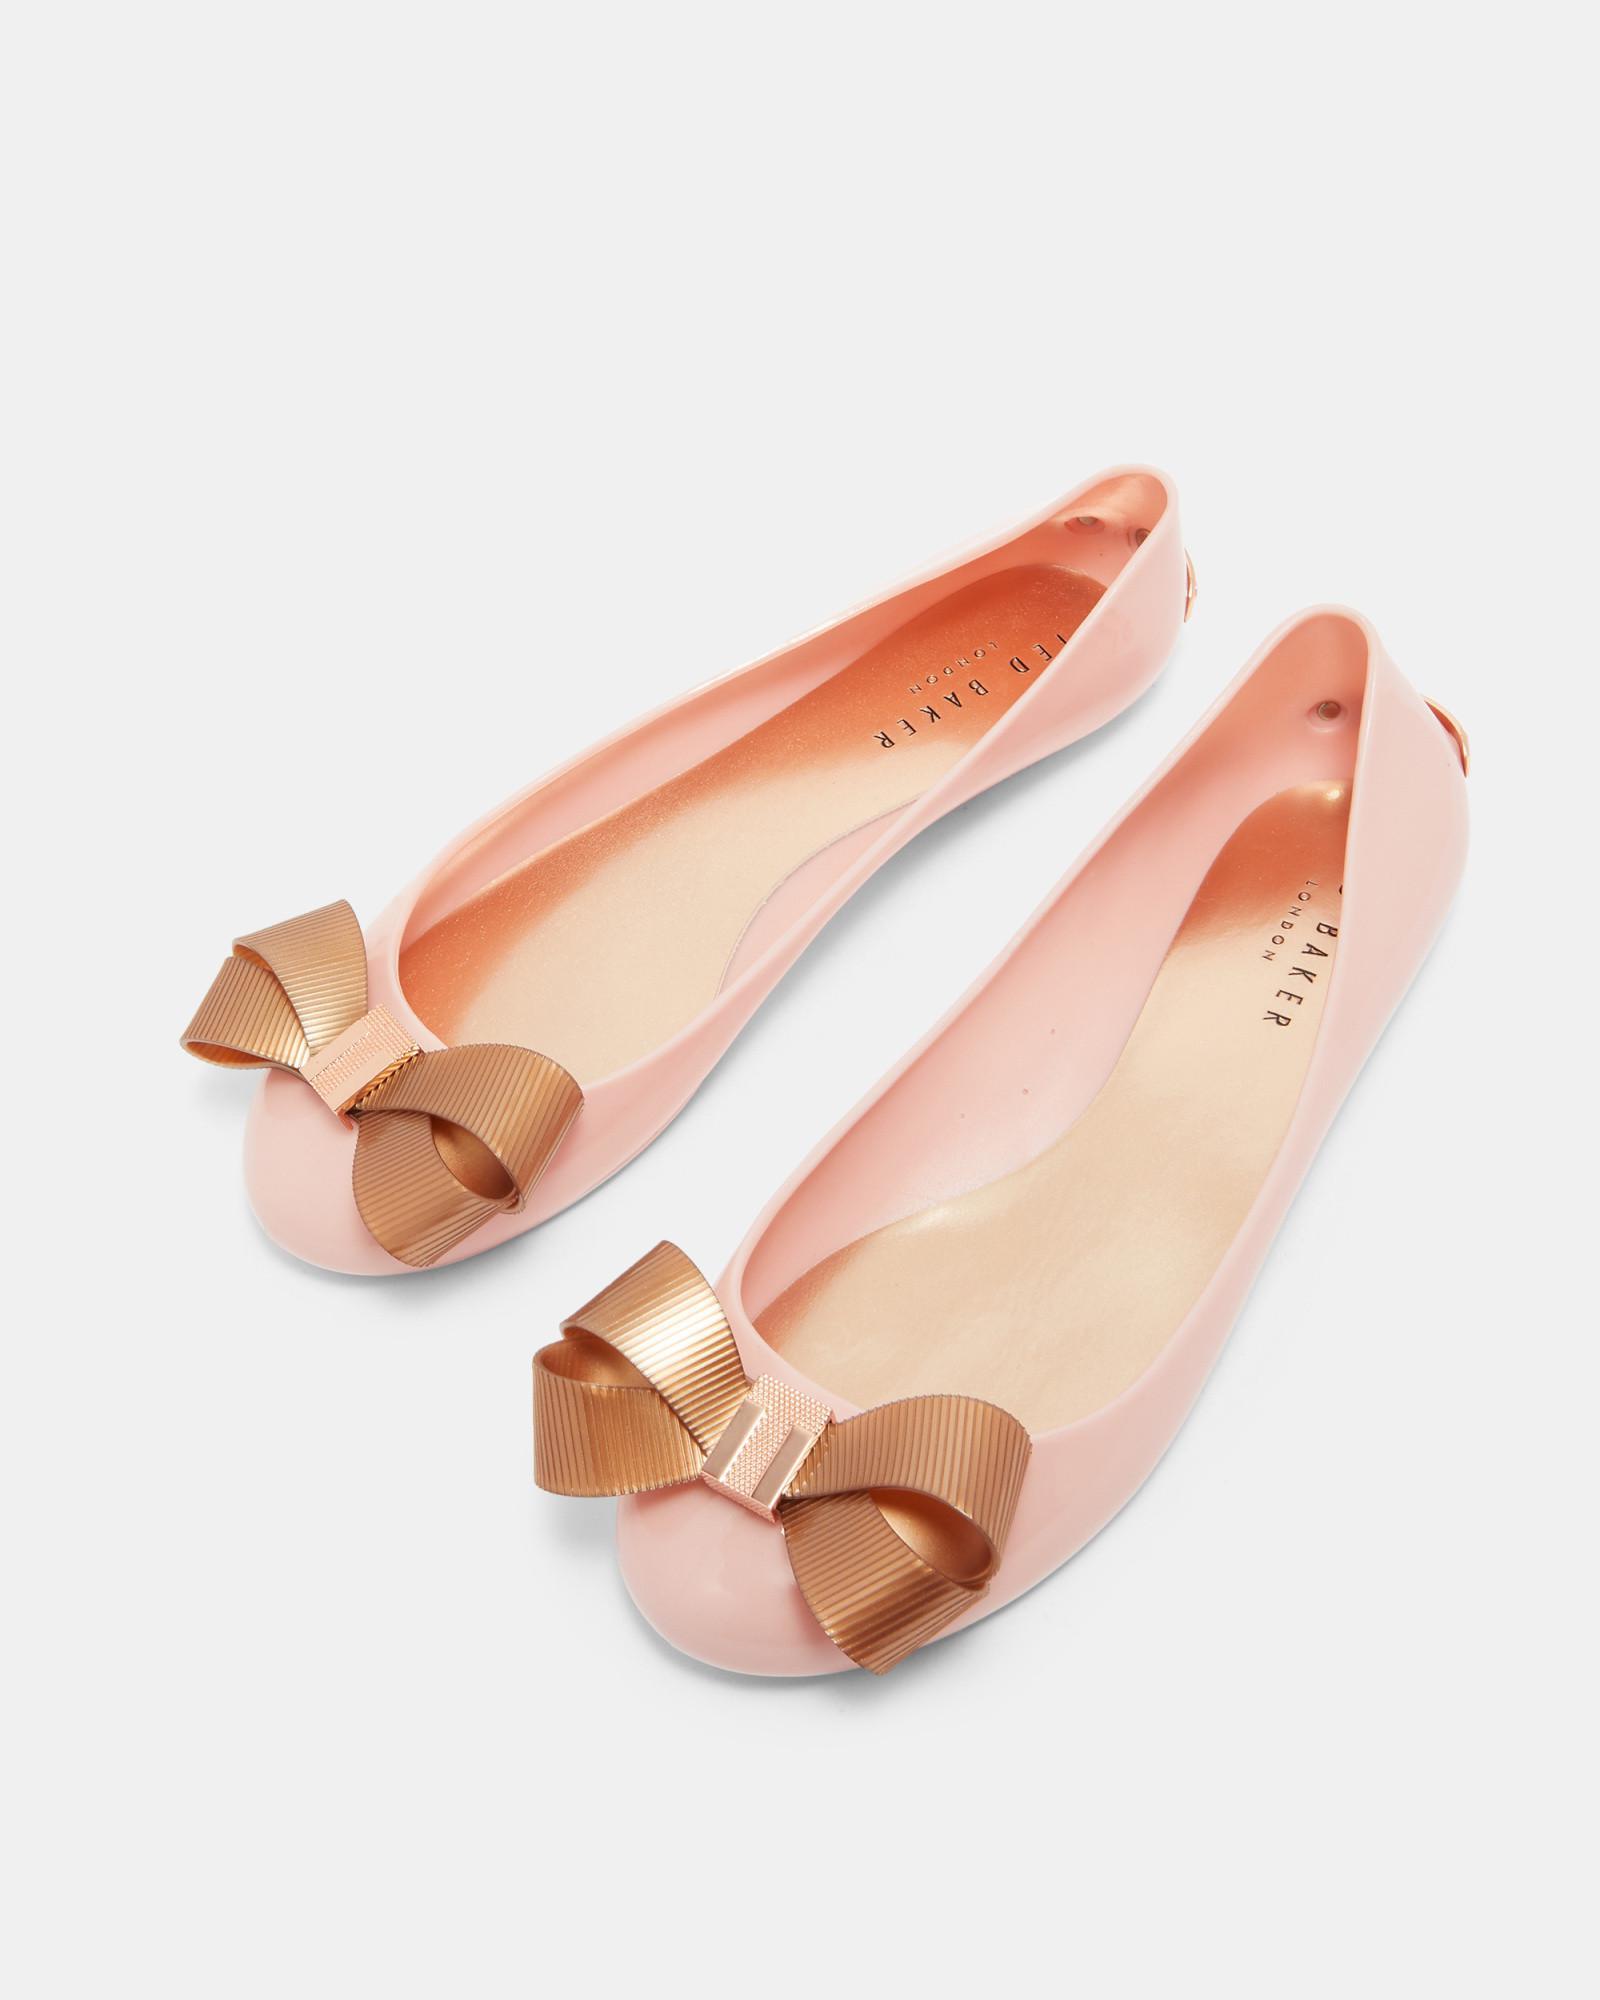 85eb667c1 Gallery. Women s Bow Slides Women s Nautical Shoes ...